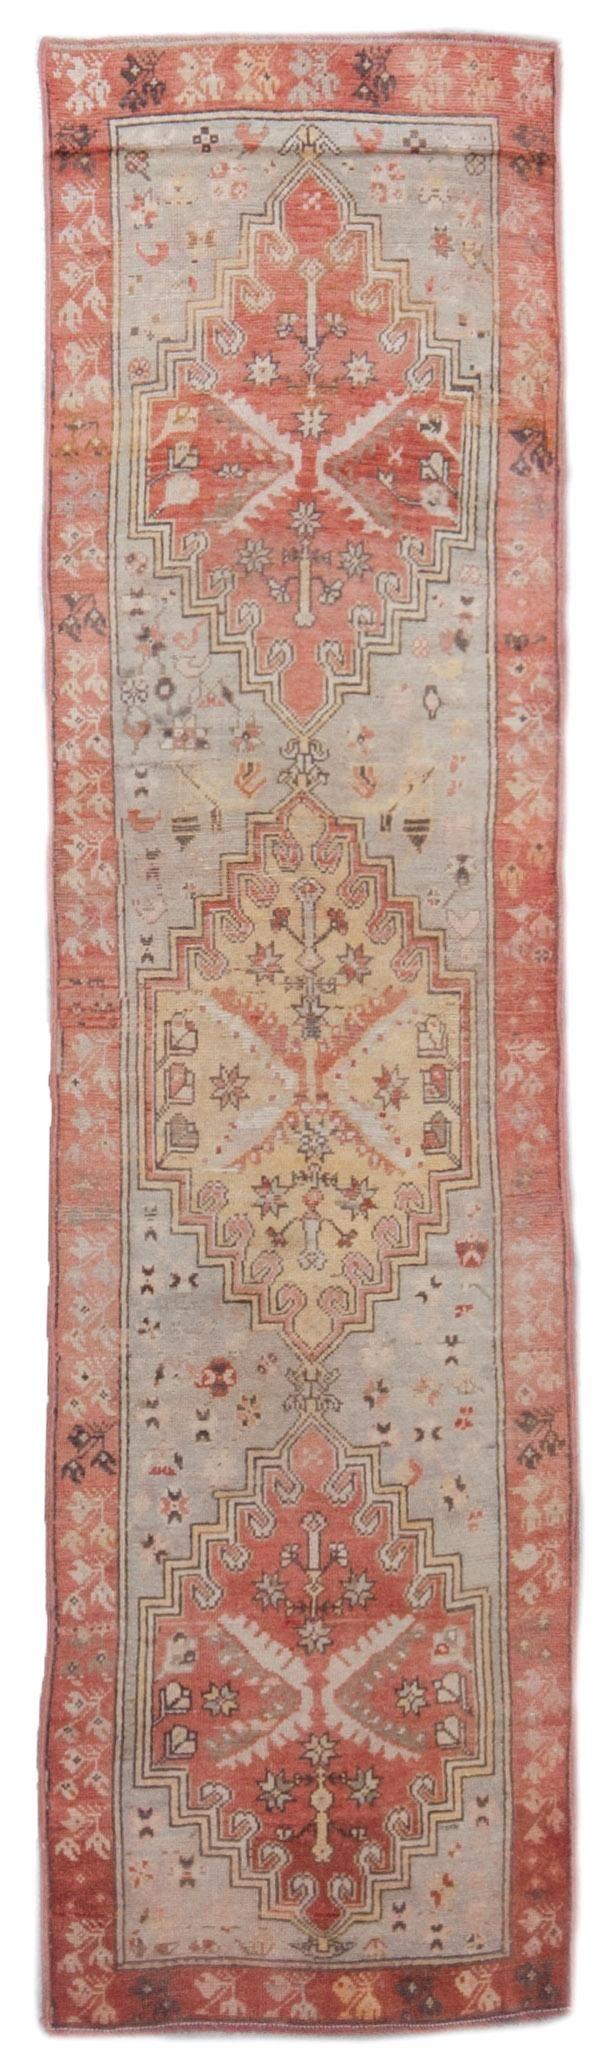 vintage oushak rug 13030   Woven Online